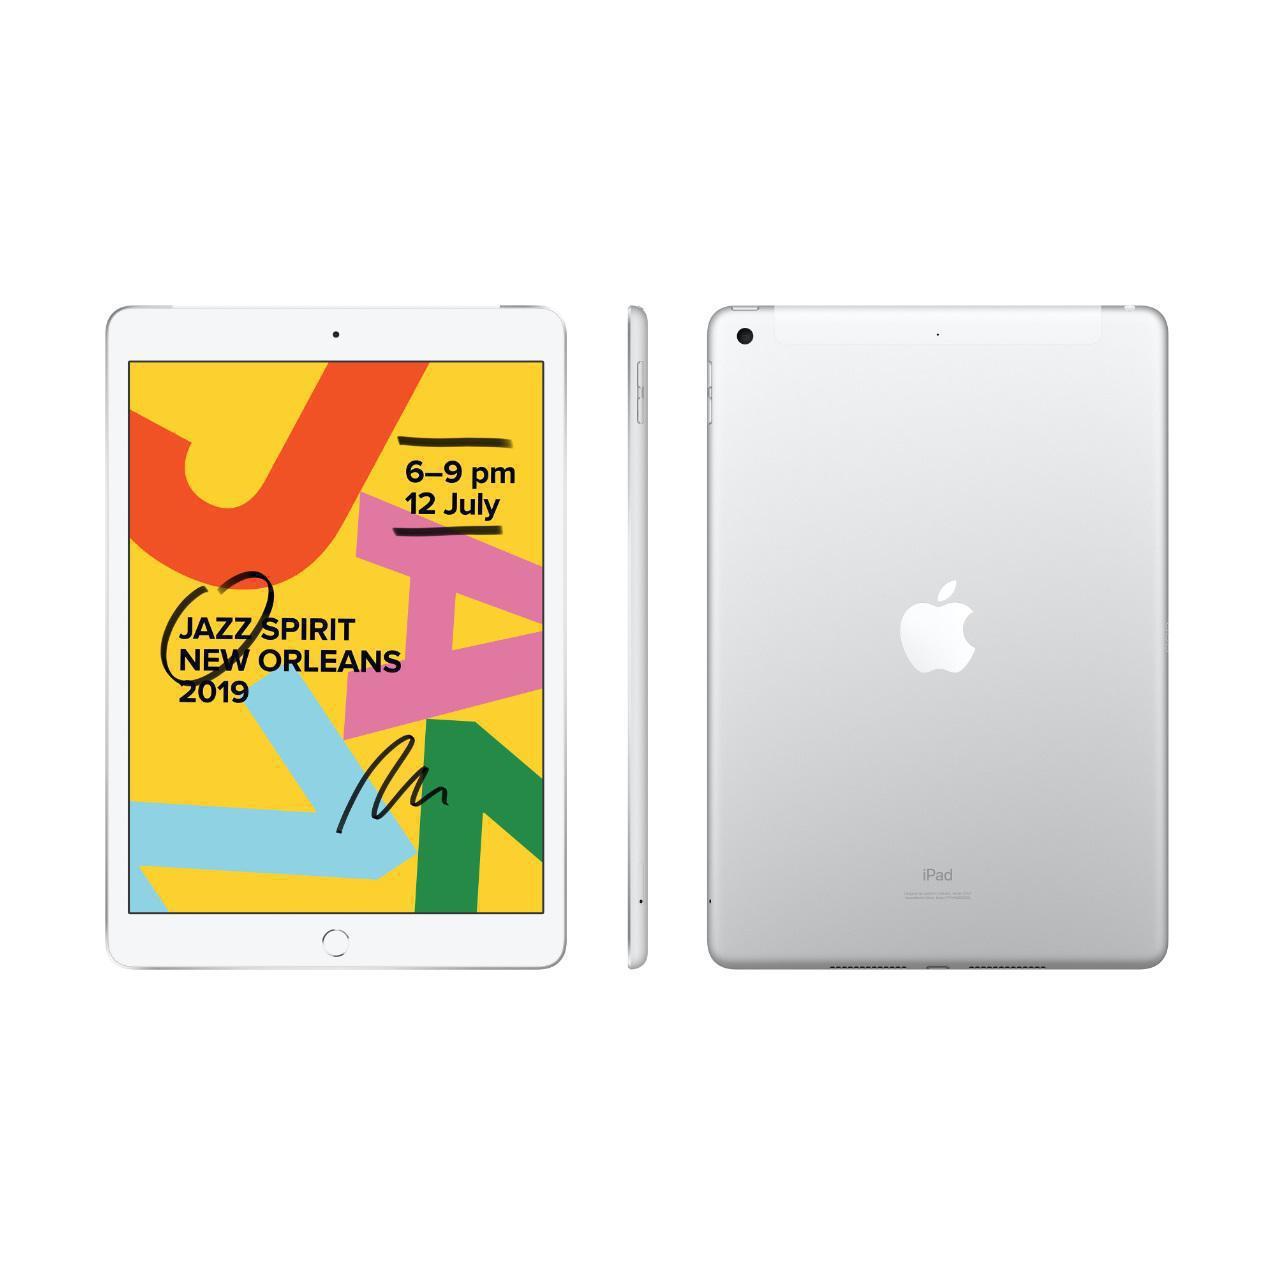 iPad 10.2-inch 7th Gen (2019) - Wi-Fi + GSM/CDMA + LTE